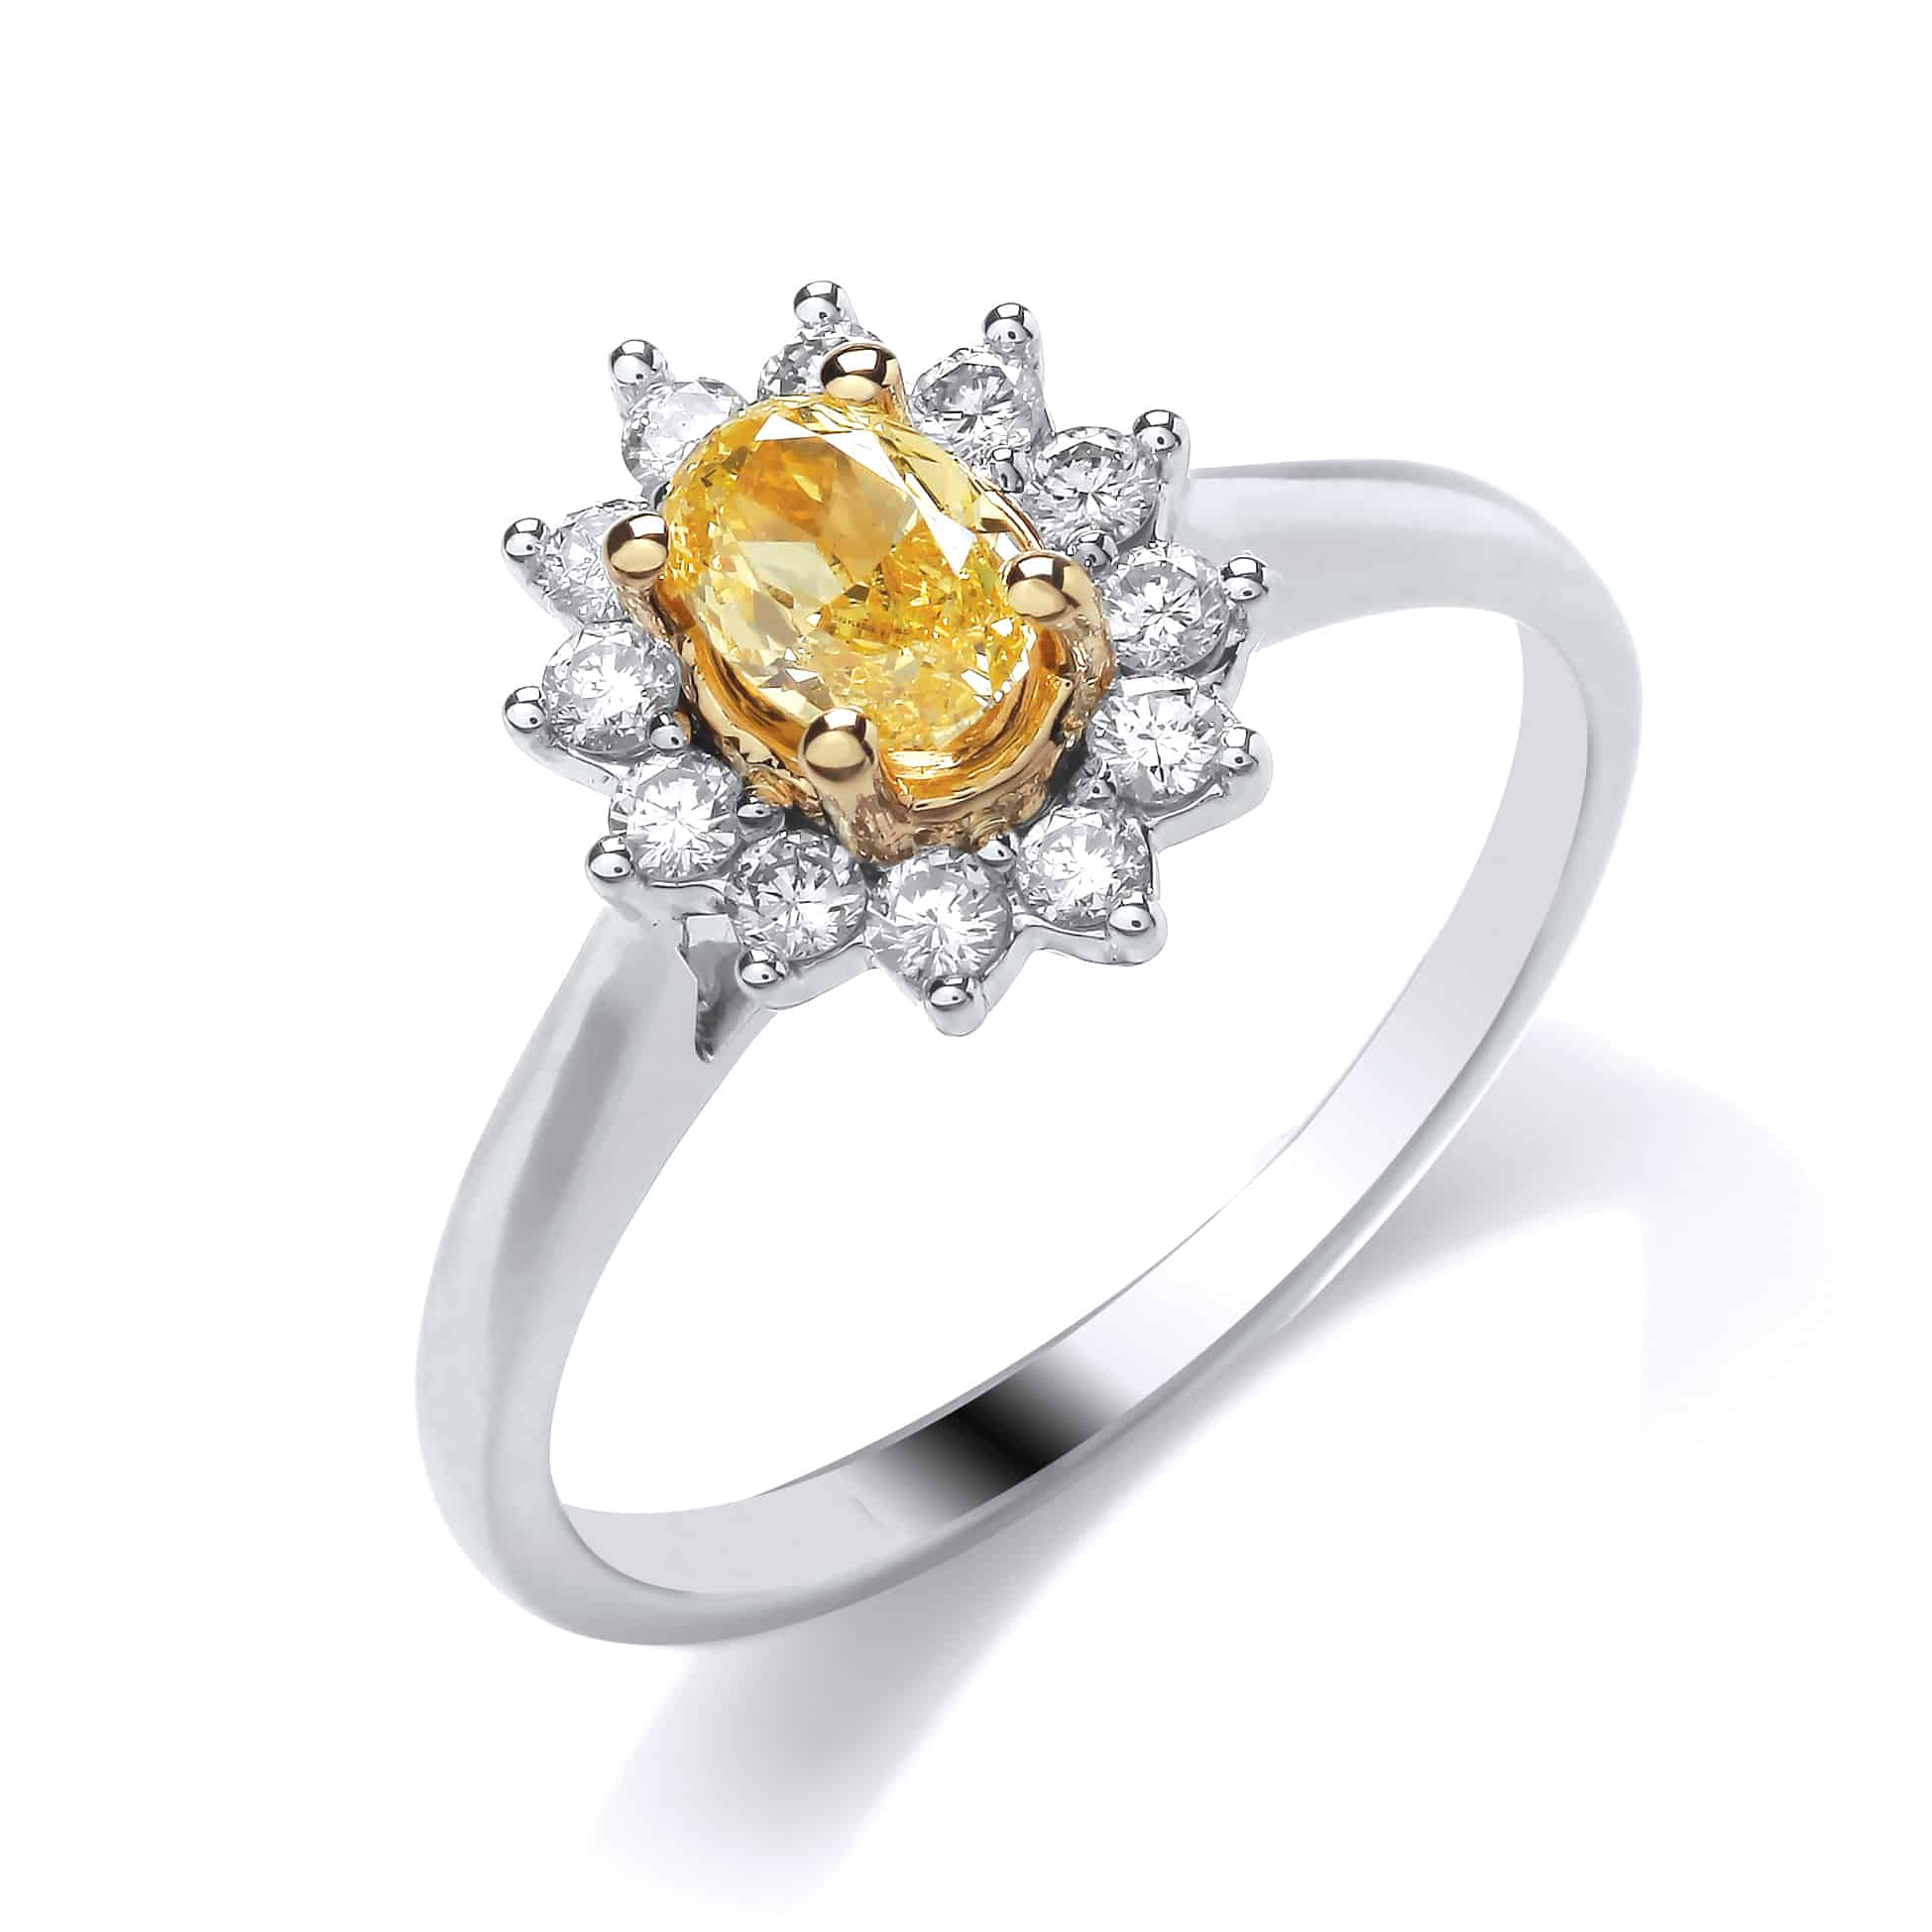 Hatton Garden diamond jewellery supplier Andre Michael reopens